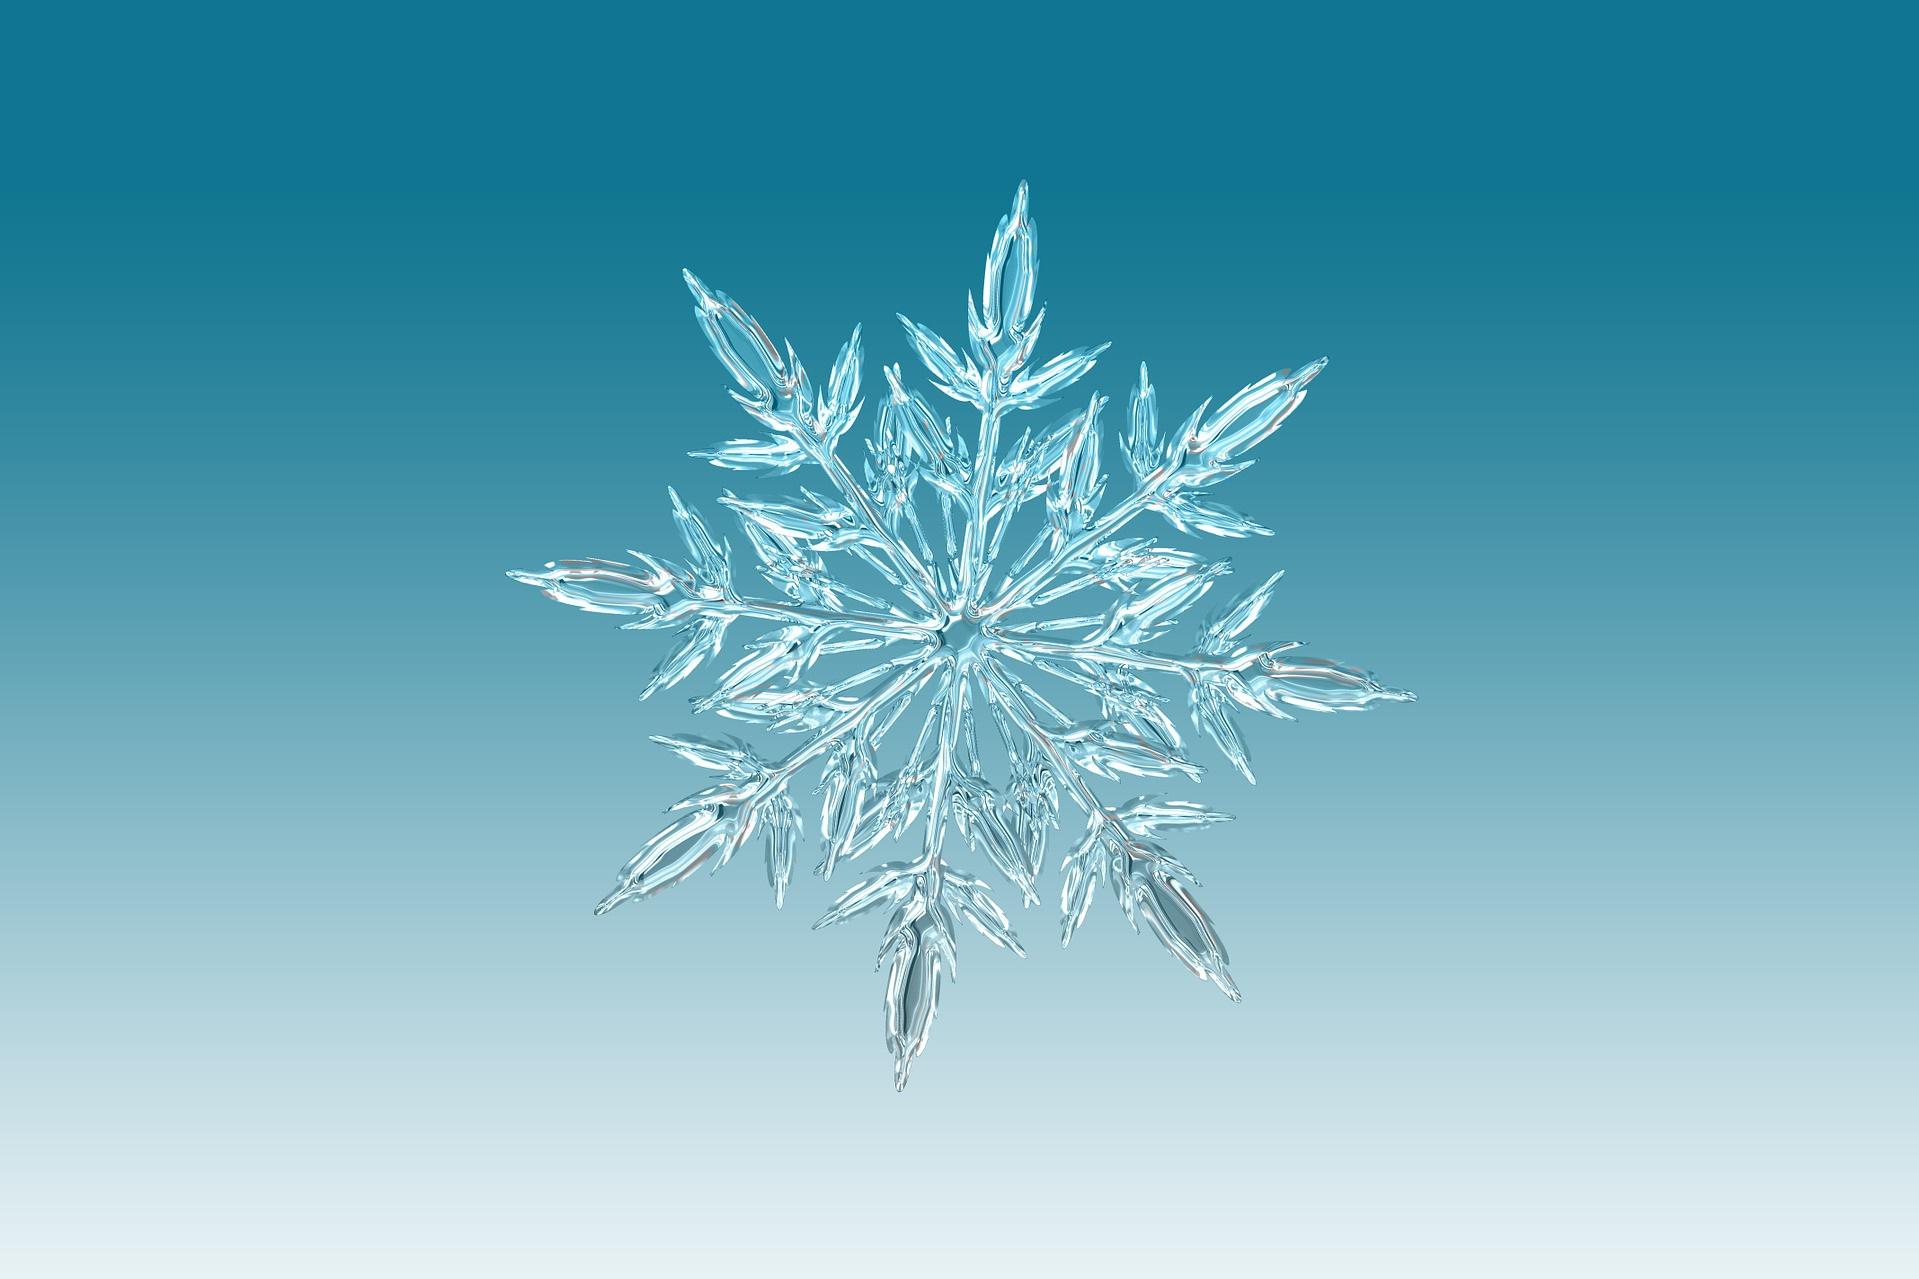 ice-crystal-1065155_1920.jpg